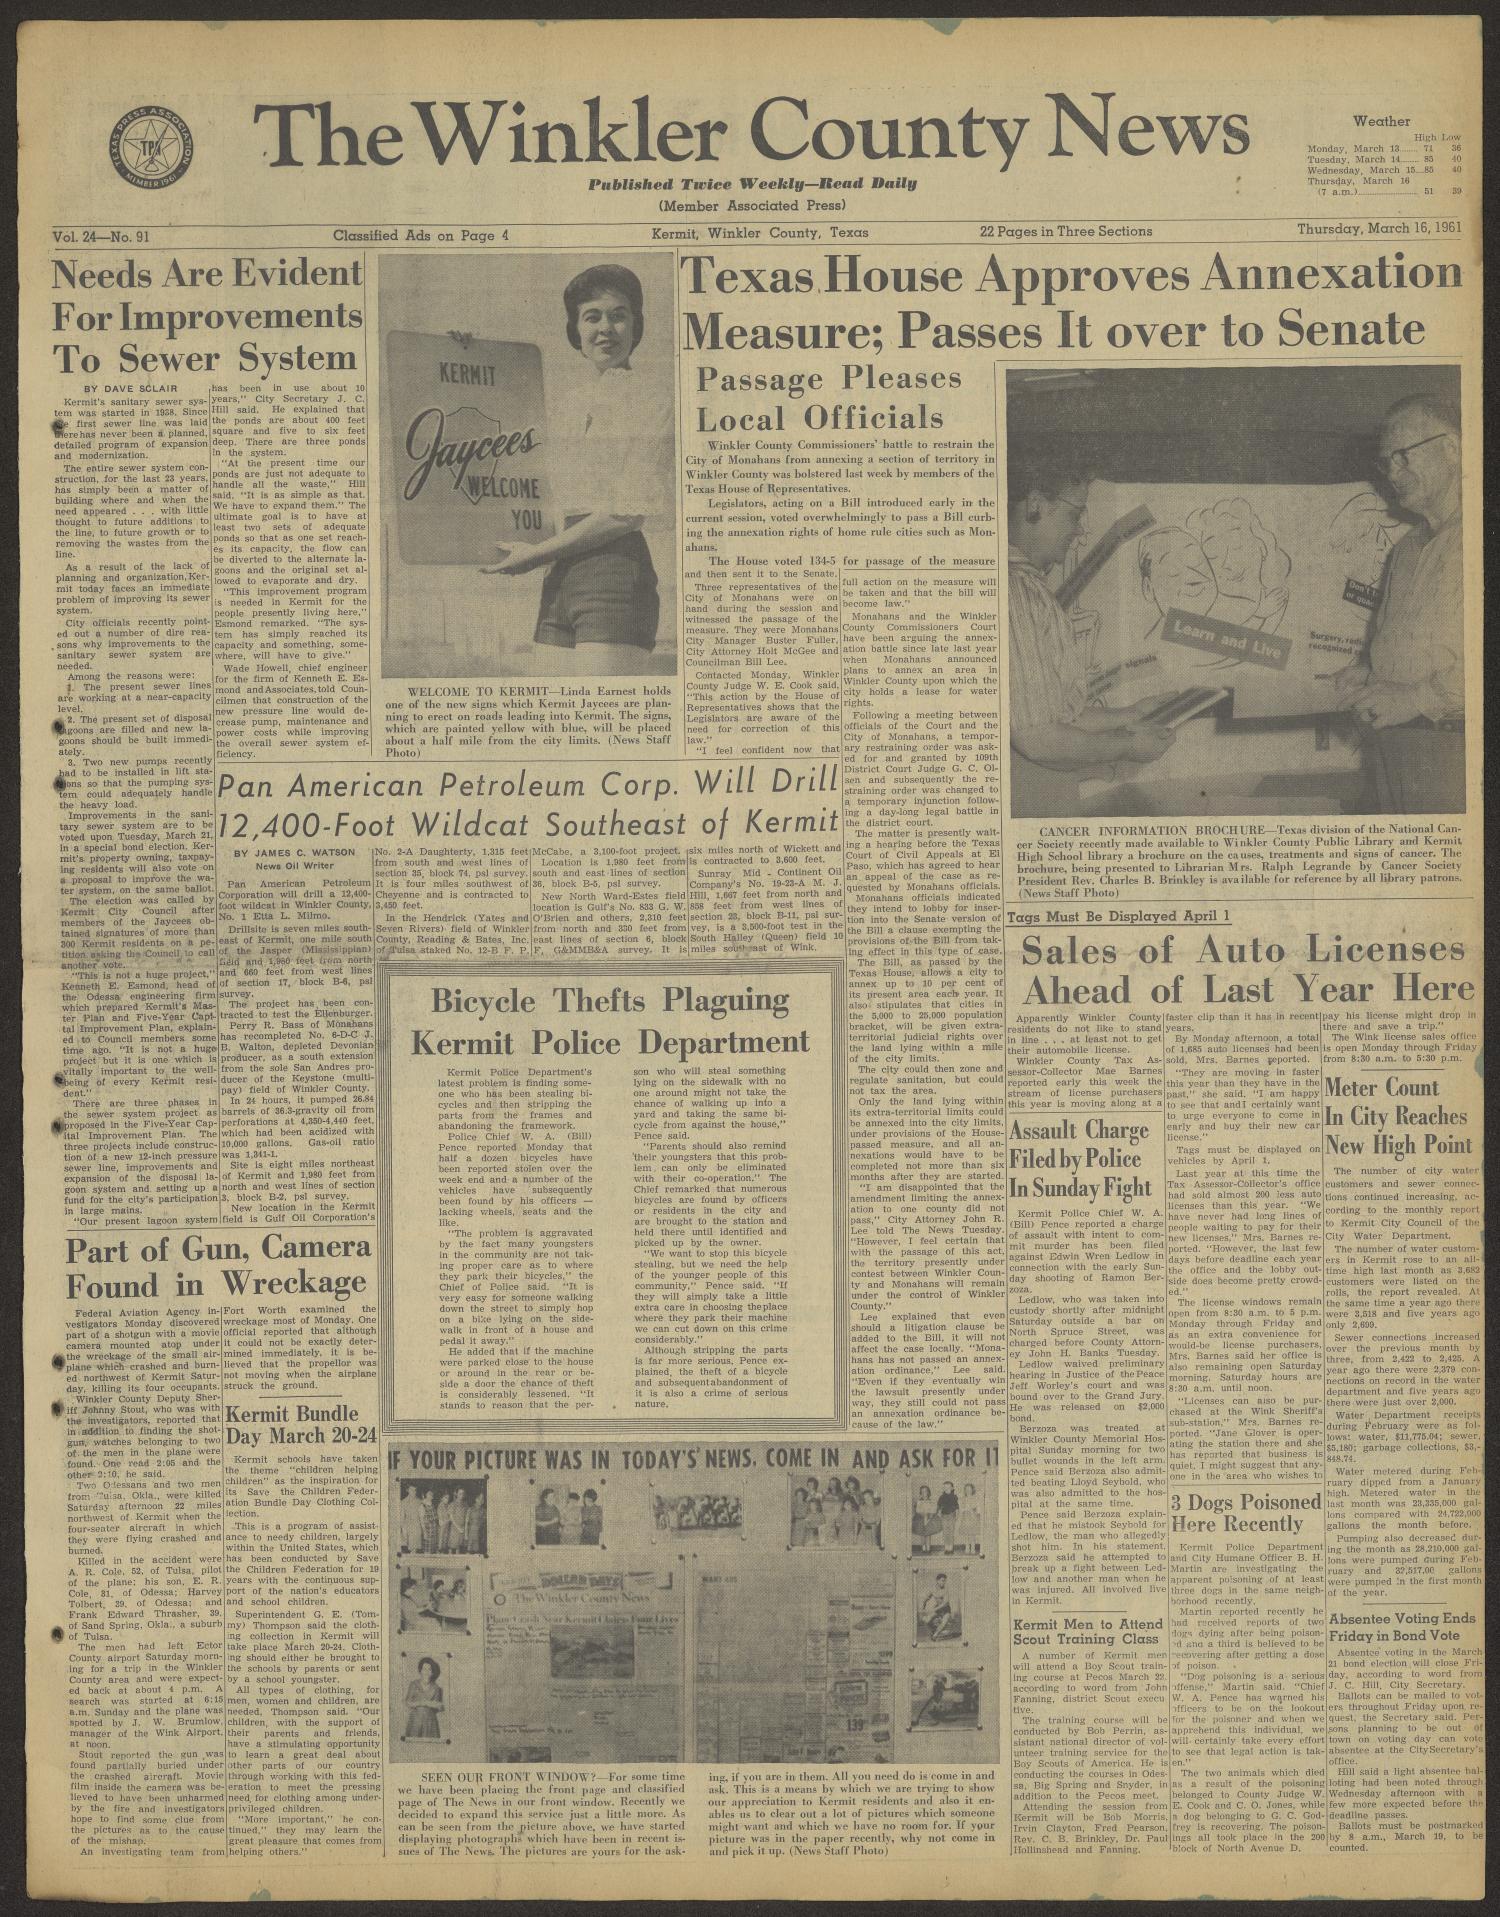 on 1 16 1961